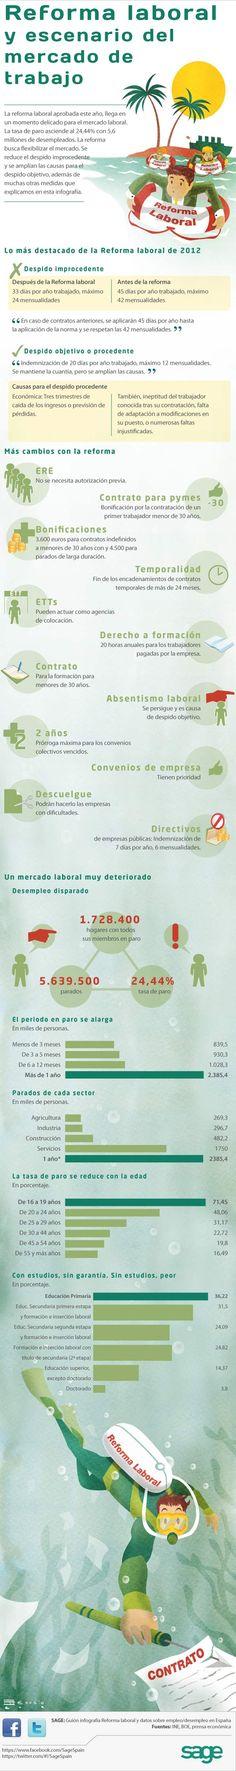 http://erafbadia.blogspot.com.es/ @erafbadia LA REFORMA LABORAL EN ESPAÑA #infografia #trabajo #empleo